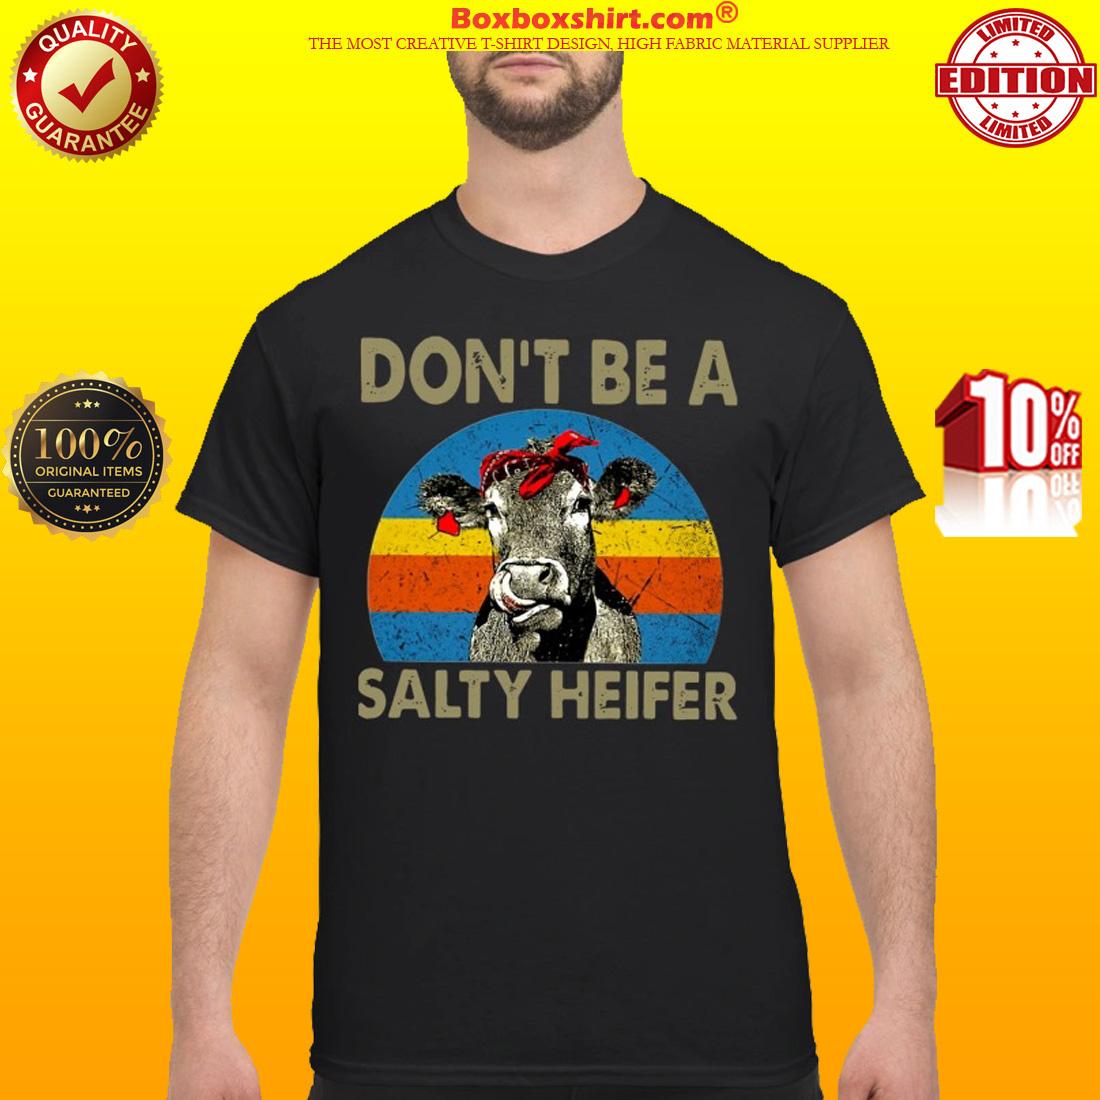 Don't Be A Salty Heifer classic Shirt